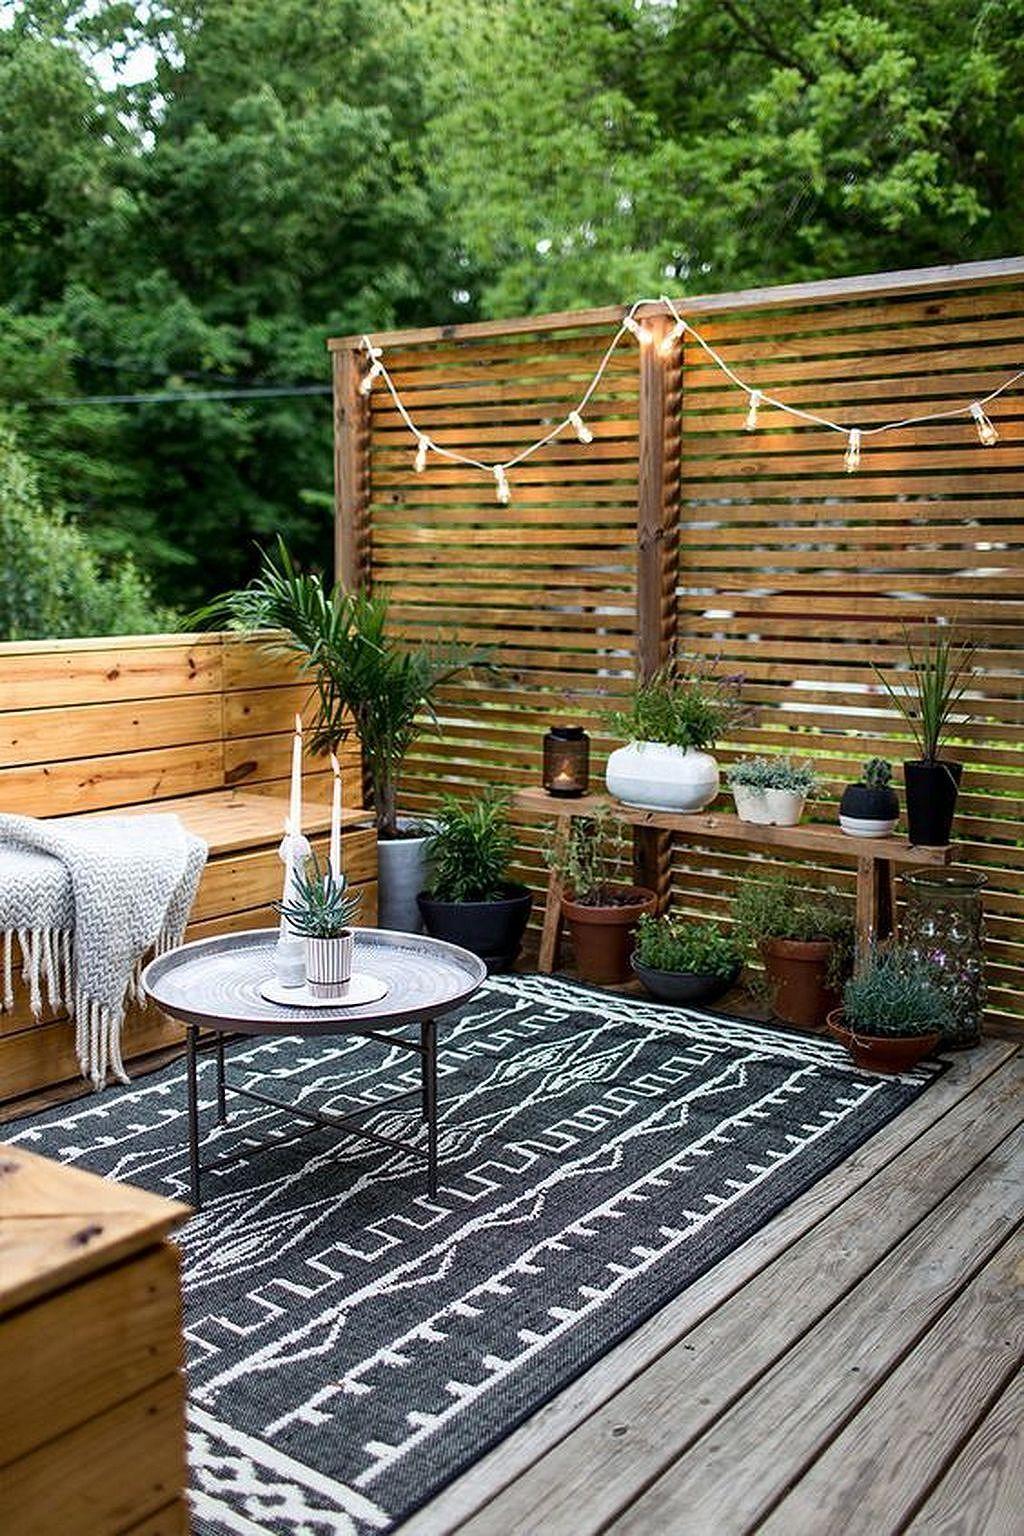 50+ Backyard Ideas on a Budget | Backyard ideas, Budget and Backyards